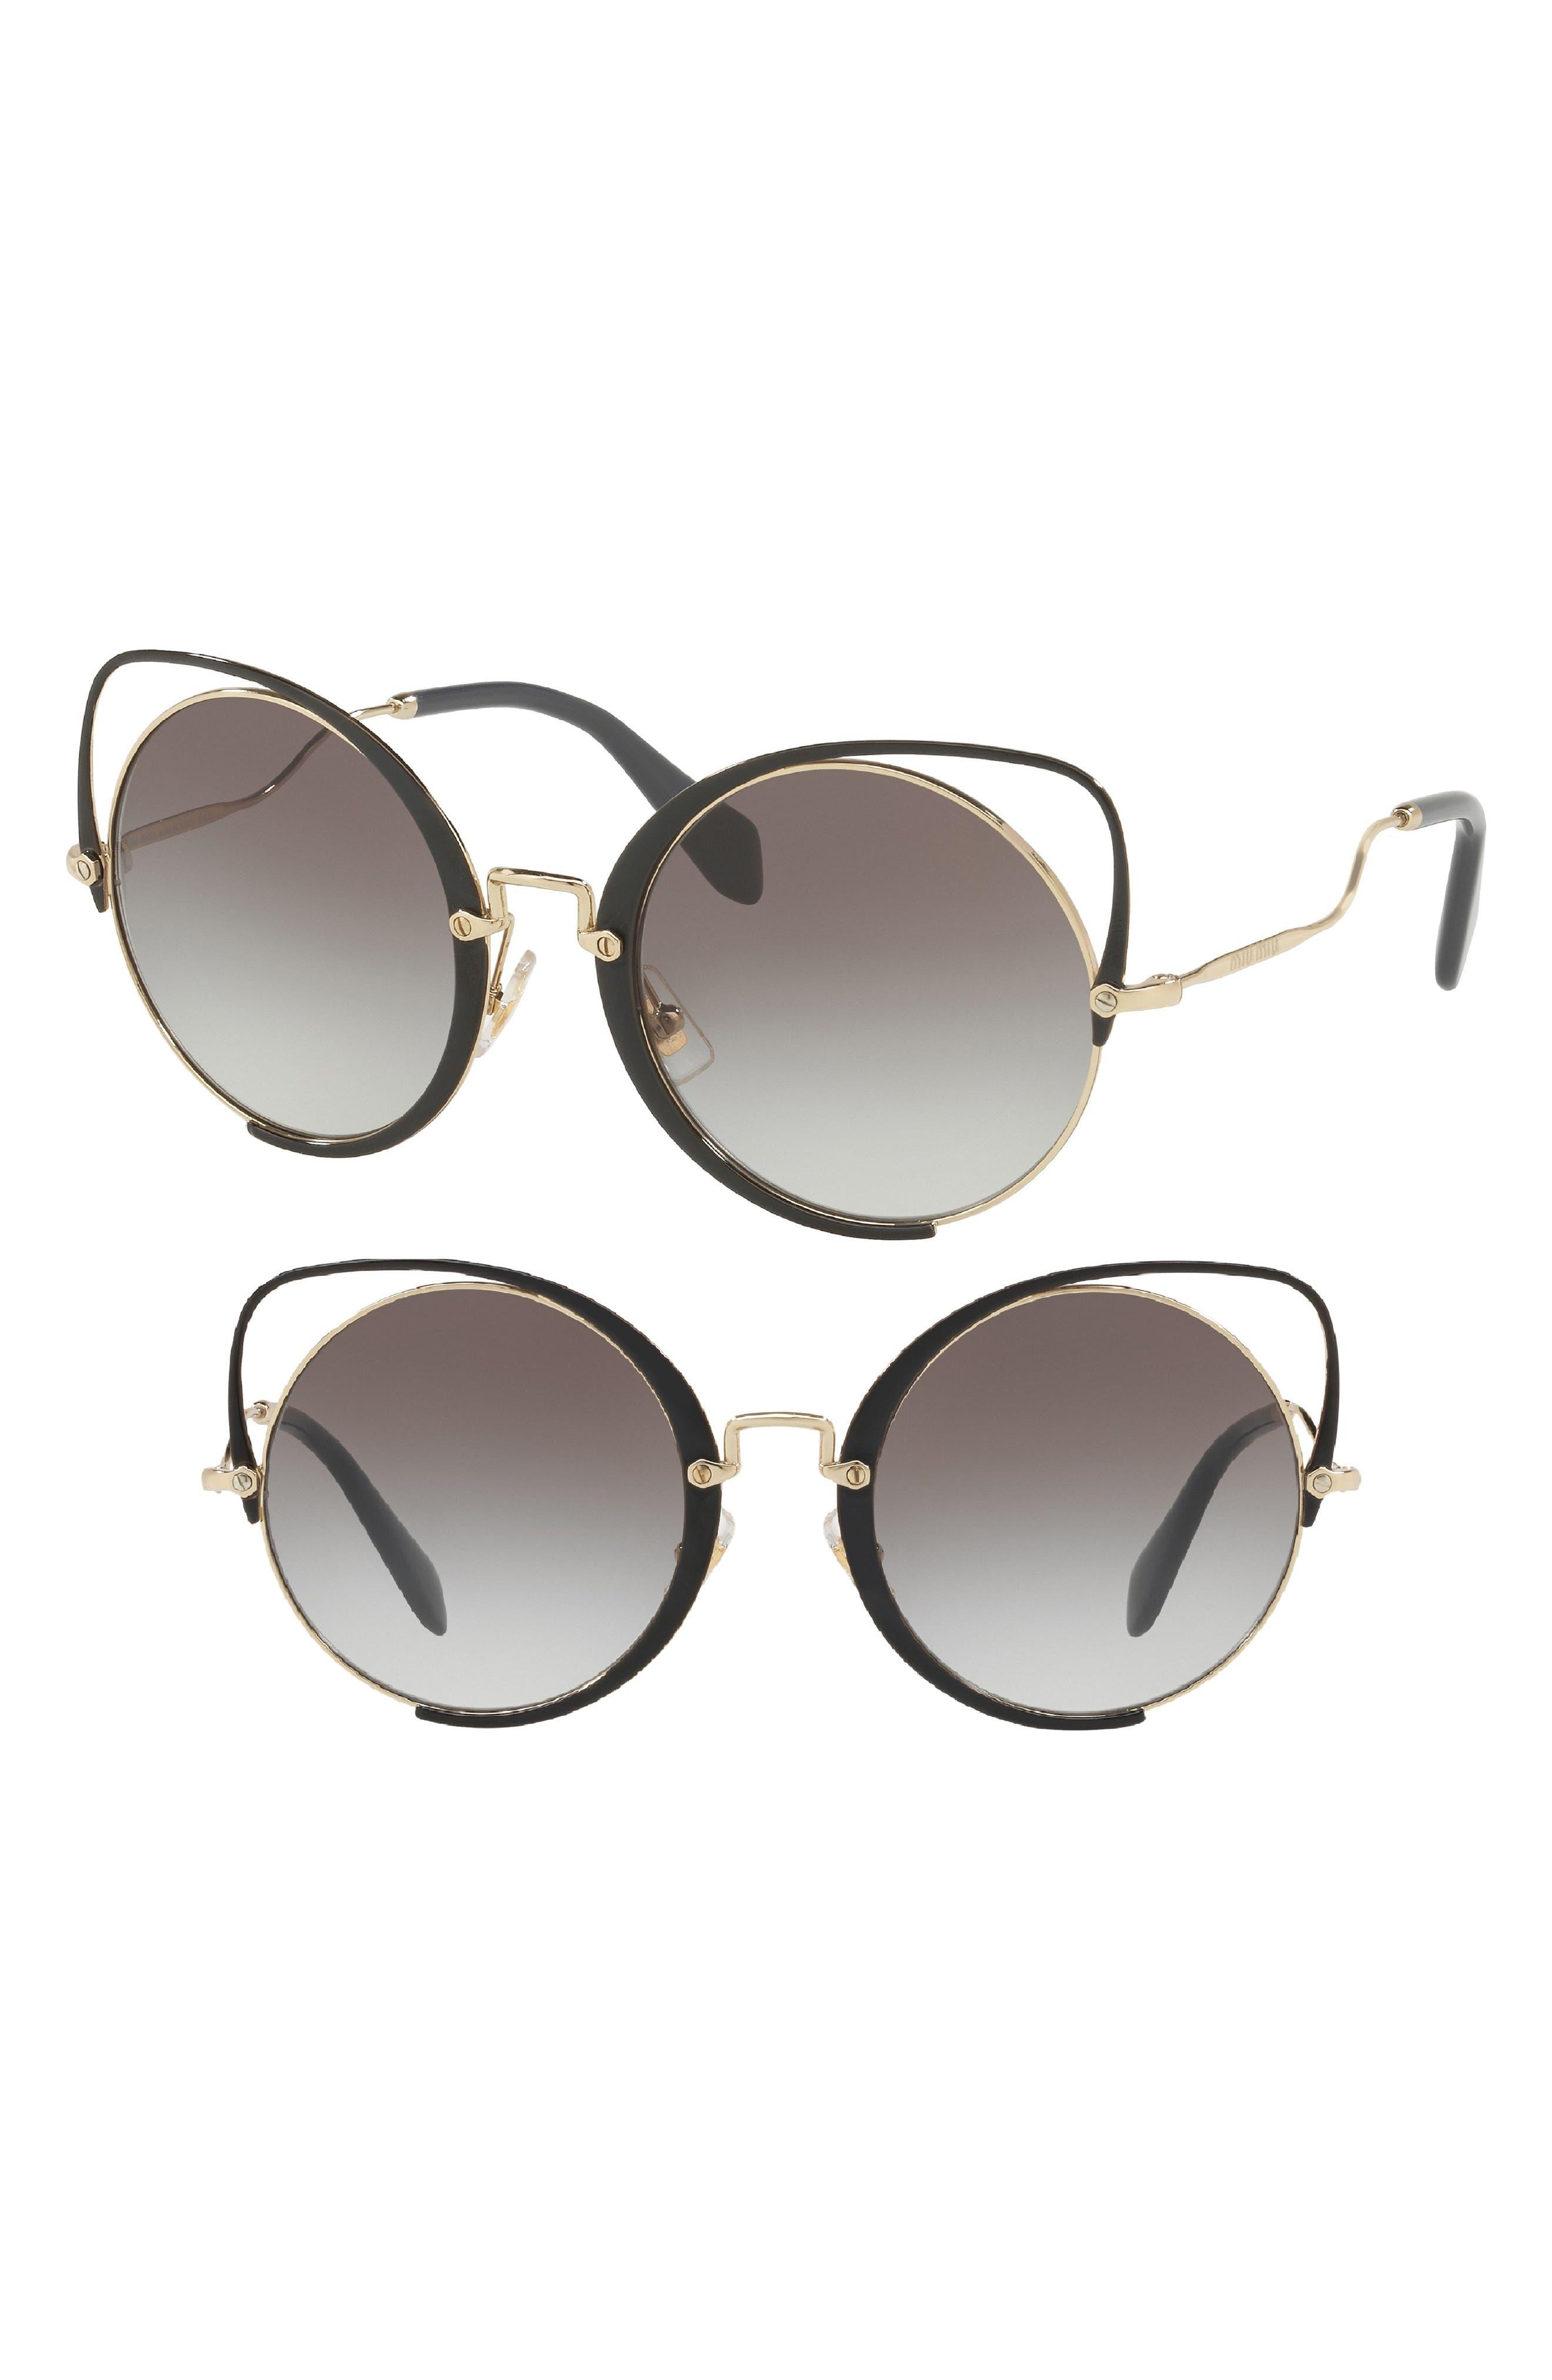 54mm Gradient Round Lens Cat Eye Sunglasses,                             Main thumbnail 1, color,                             010